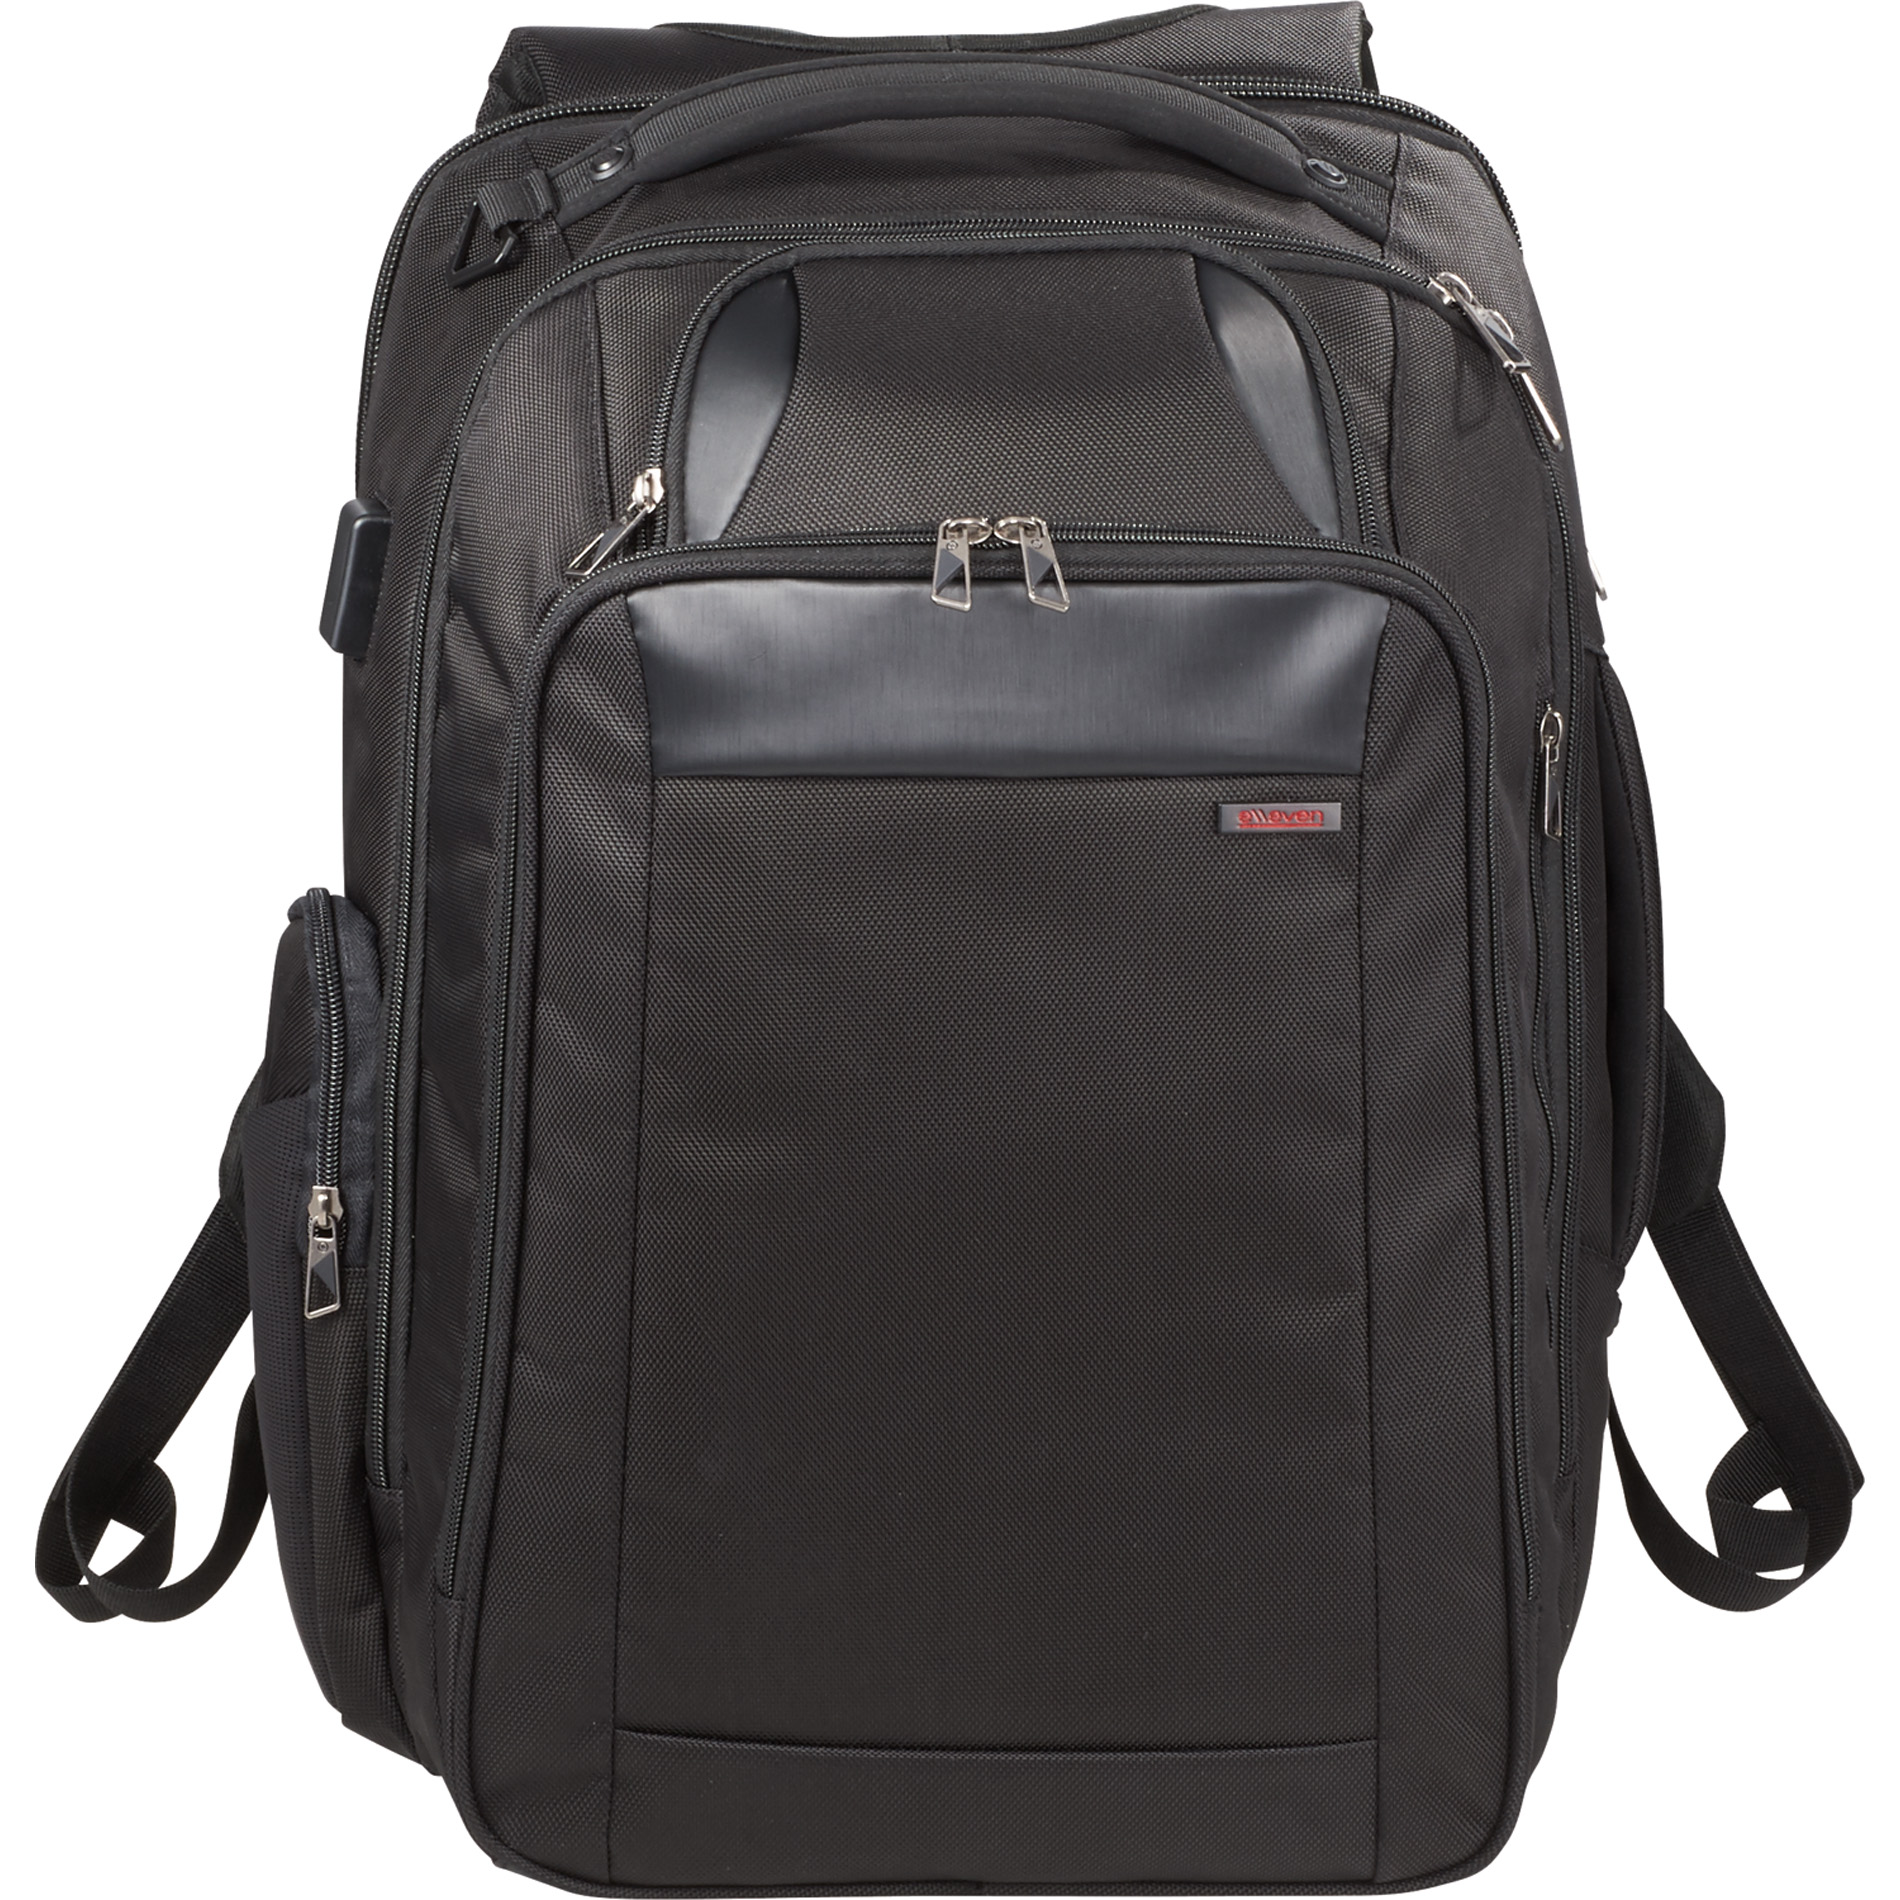 "elleven 0011-92 - Stow TSA 17"" Computer Backpack"